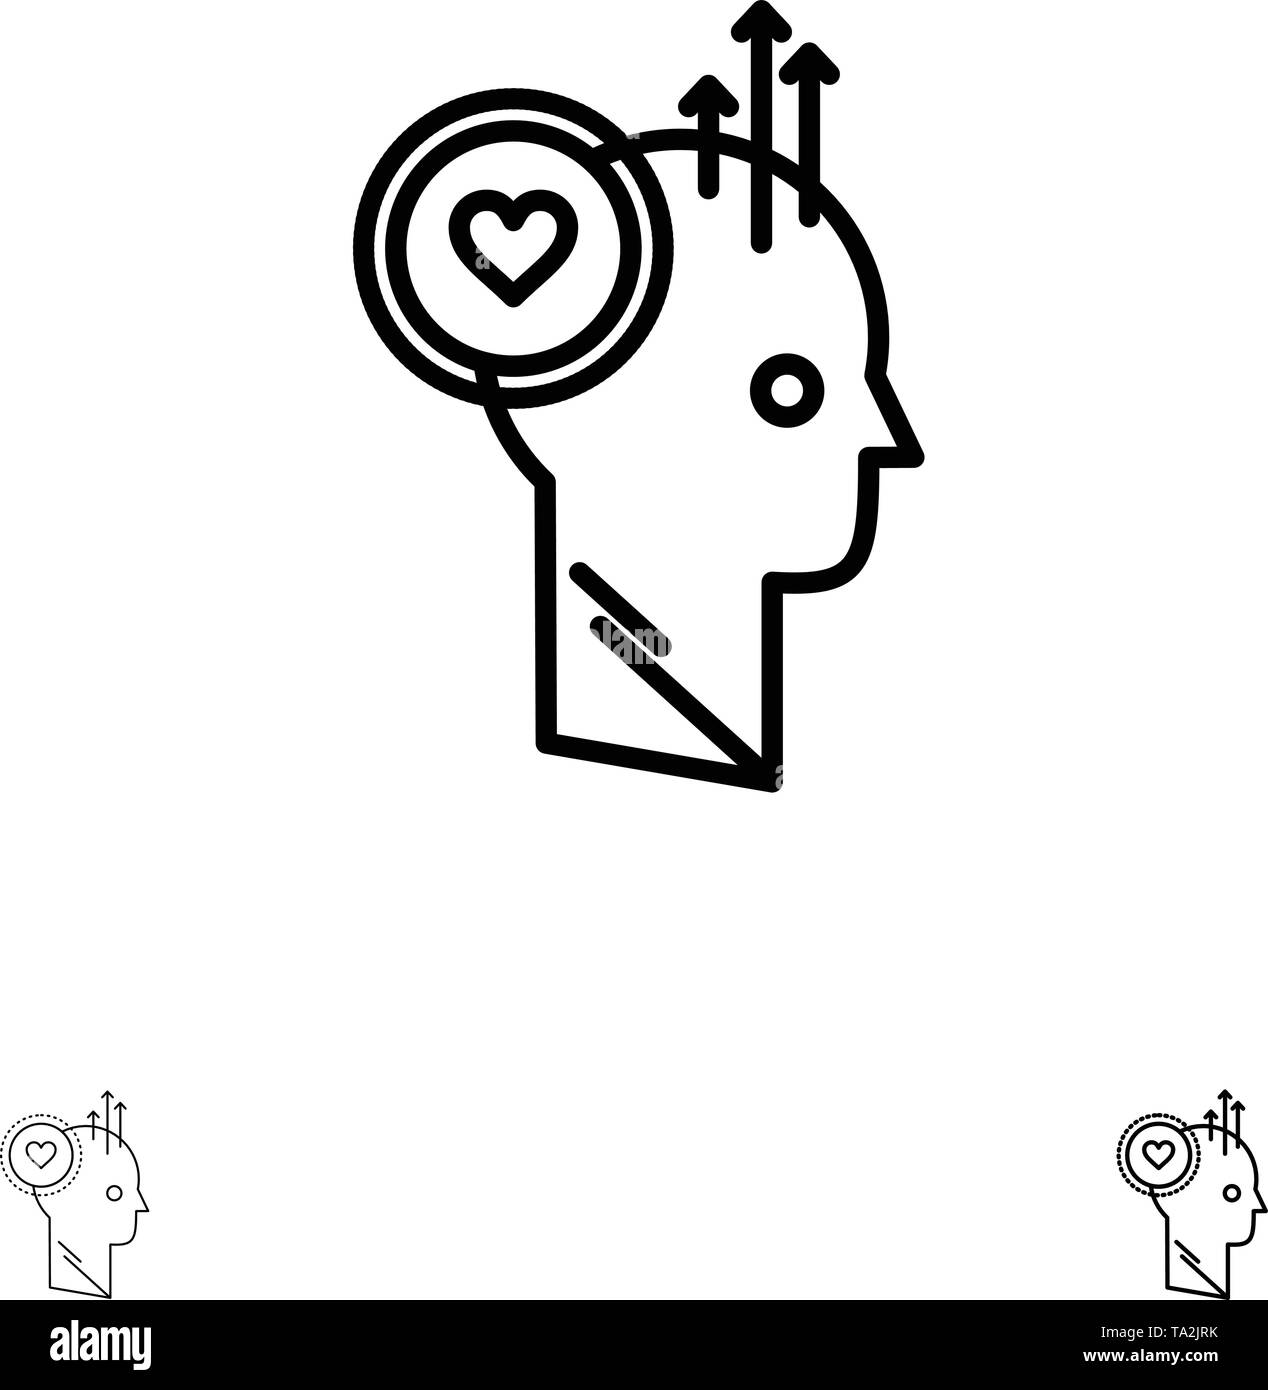 Benutzer, wie, Personal, Büro, Idee, Fett und dünne schwarze Linie Icon Set Stockbild